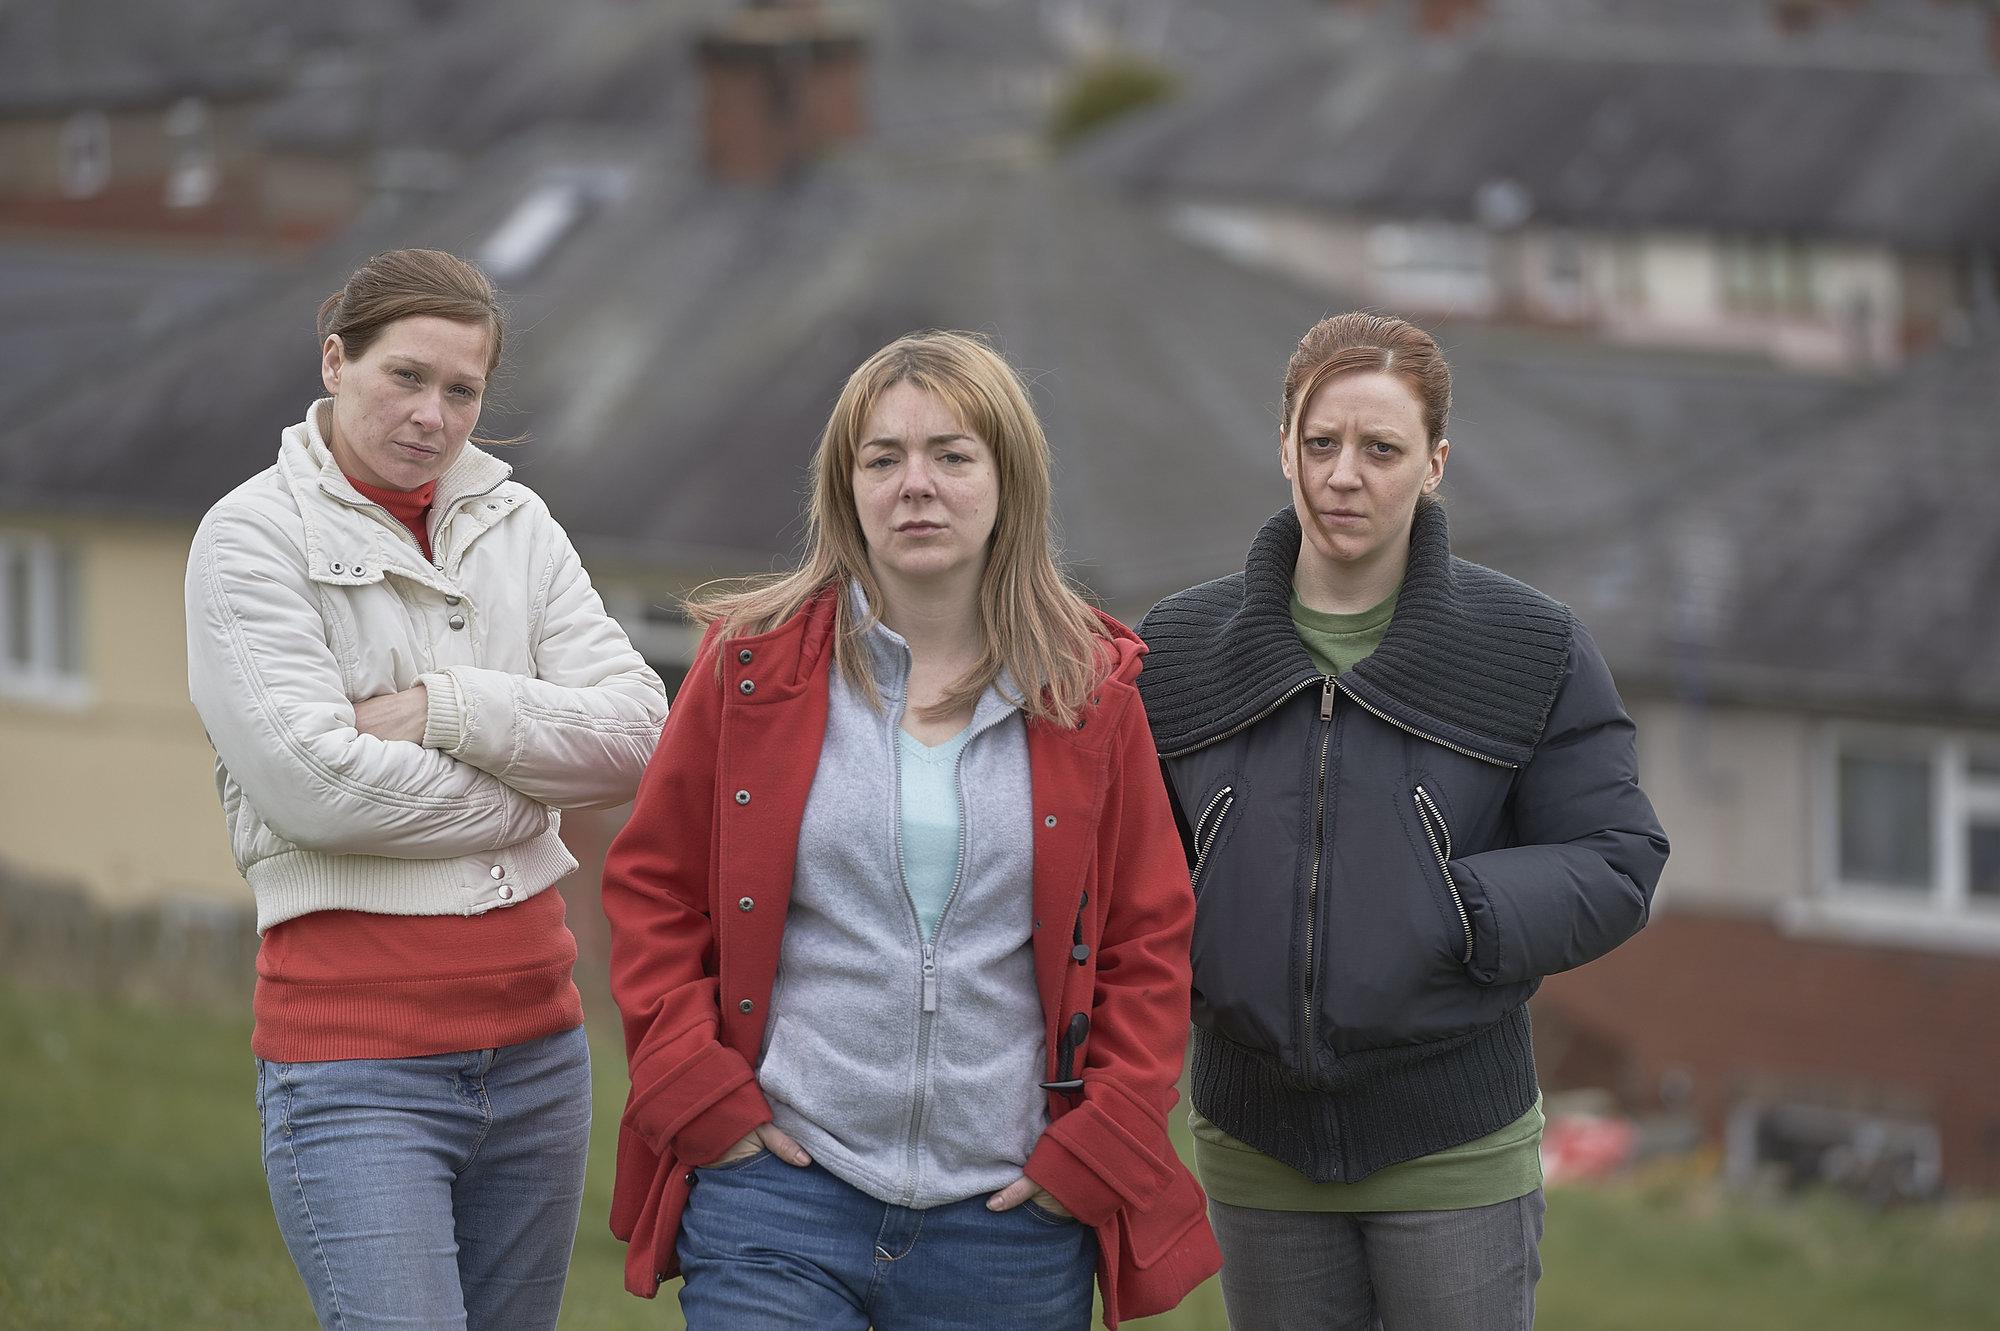 'Moorside': What Happened When Sheridan Smith Met Her Real-Life